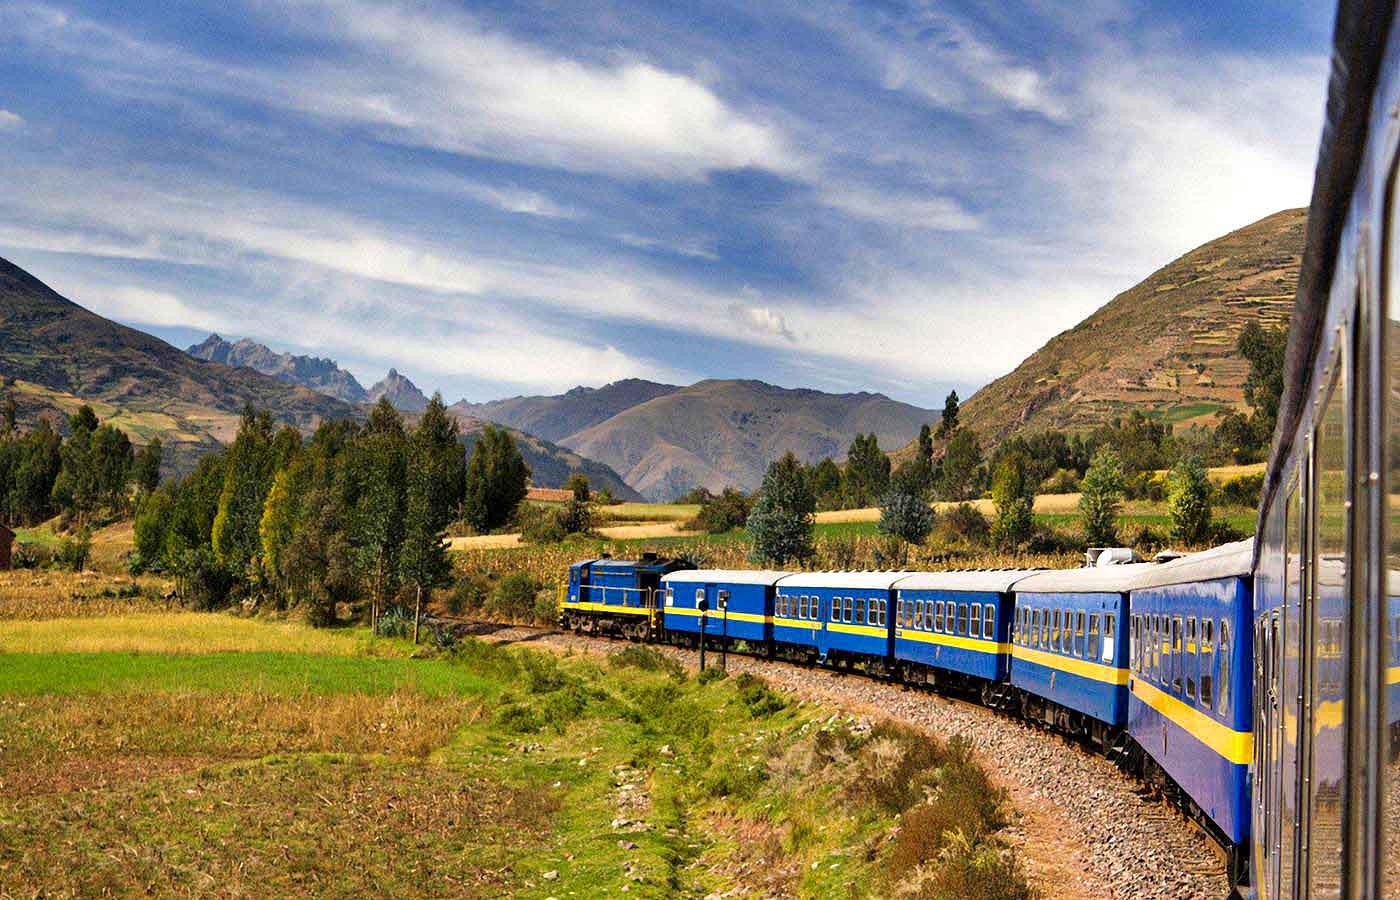 Take the train to Machu Picchu on a luxury holiday to Peru